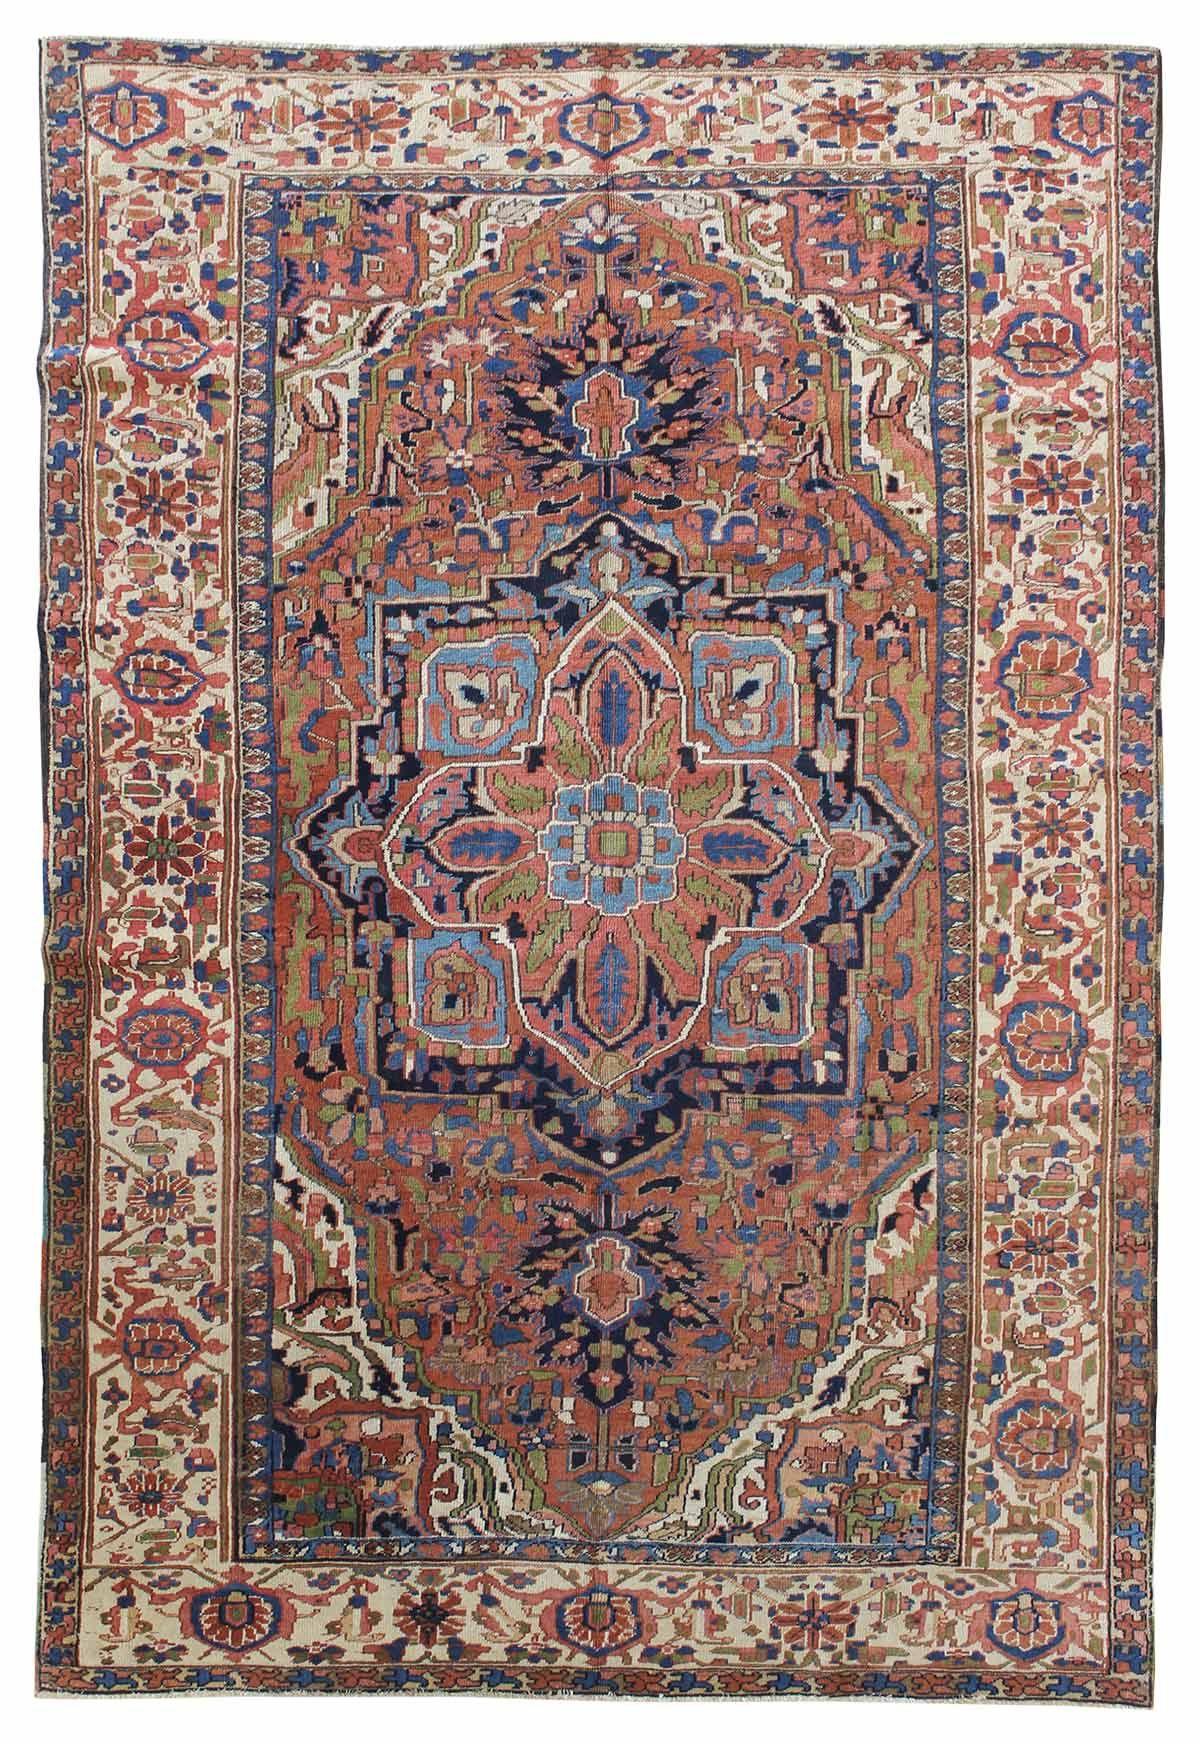 Antique Heriz Rug Handknotted in Persia Circa 1920 (con